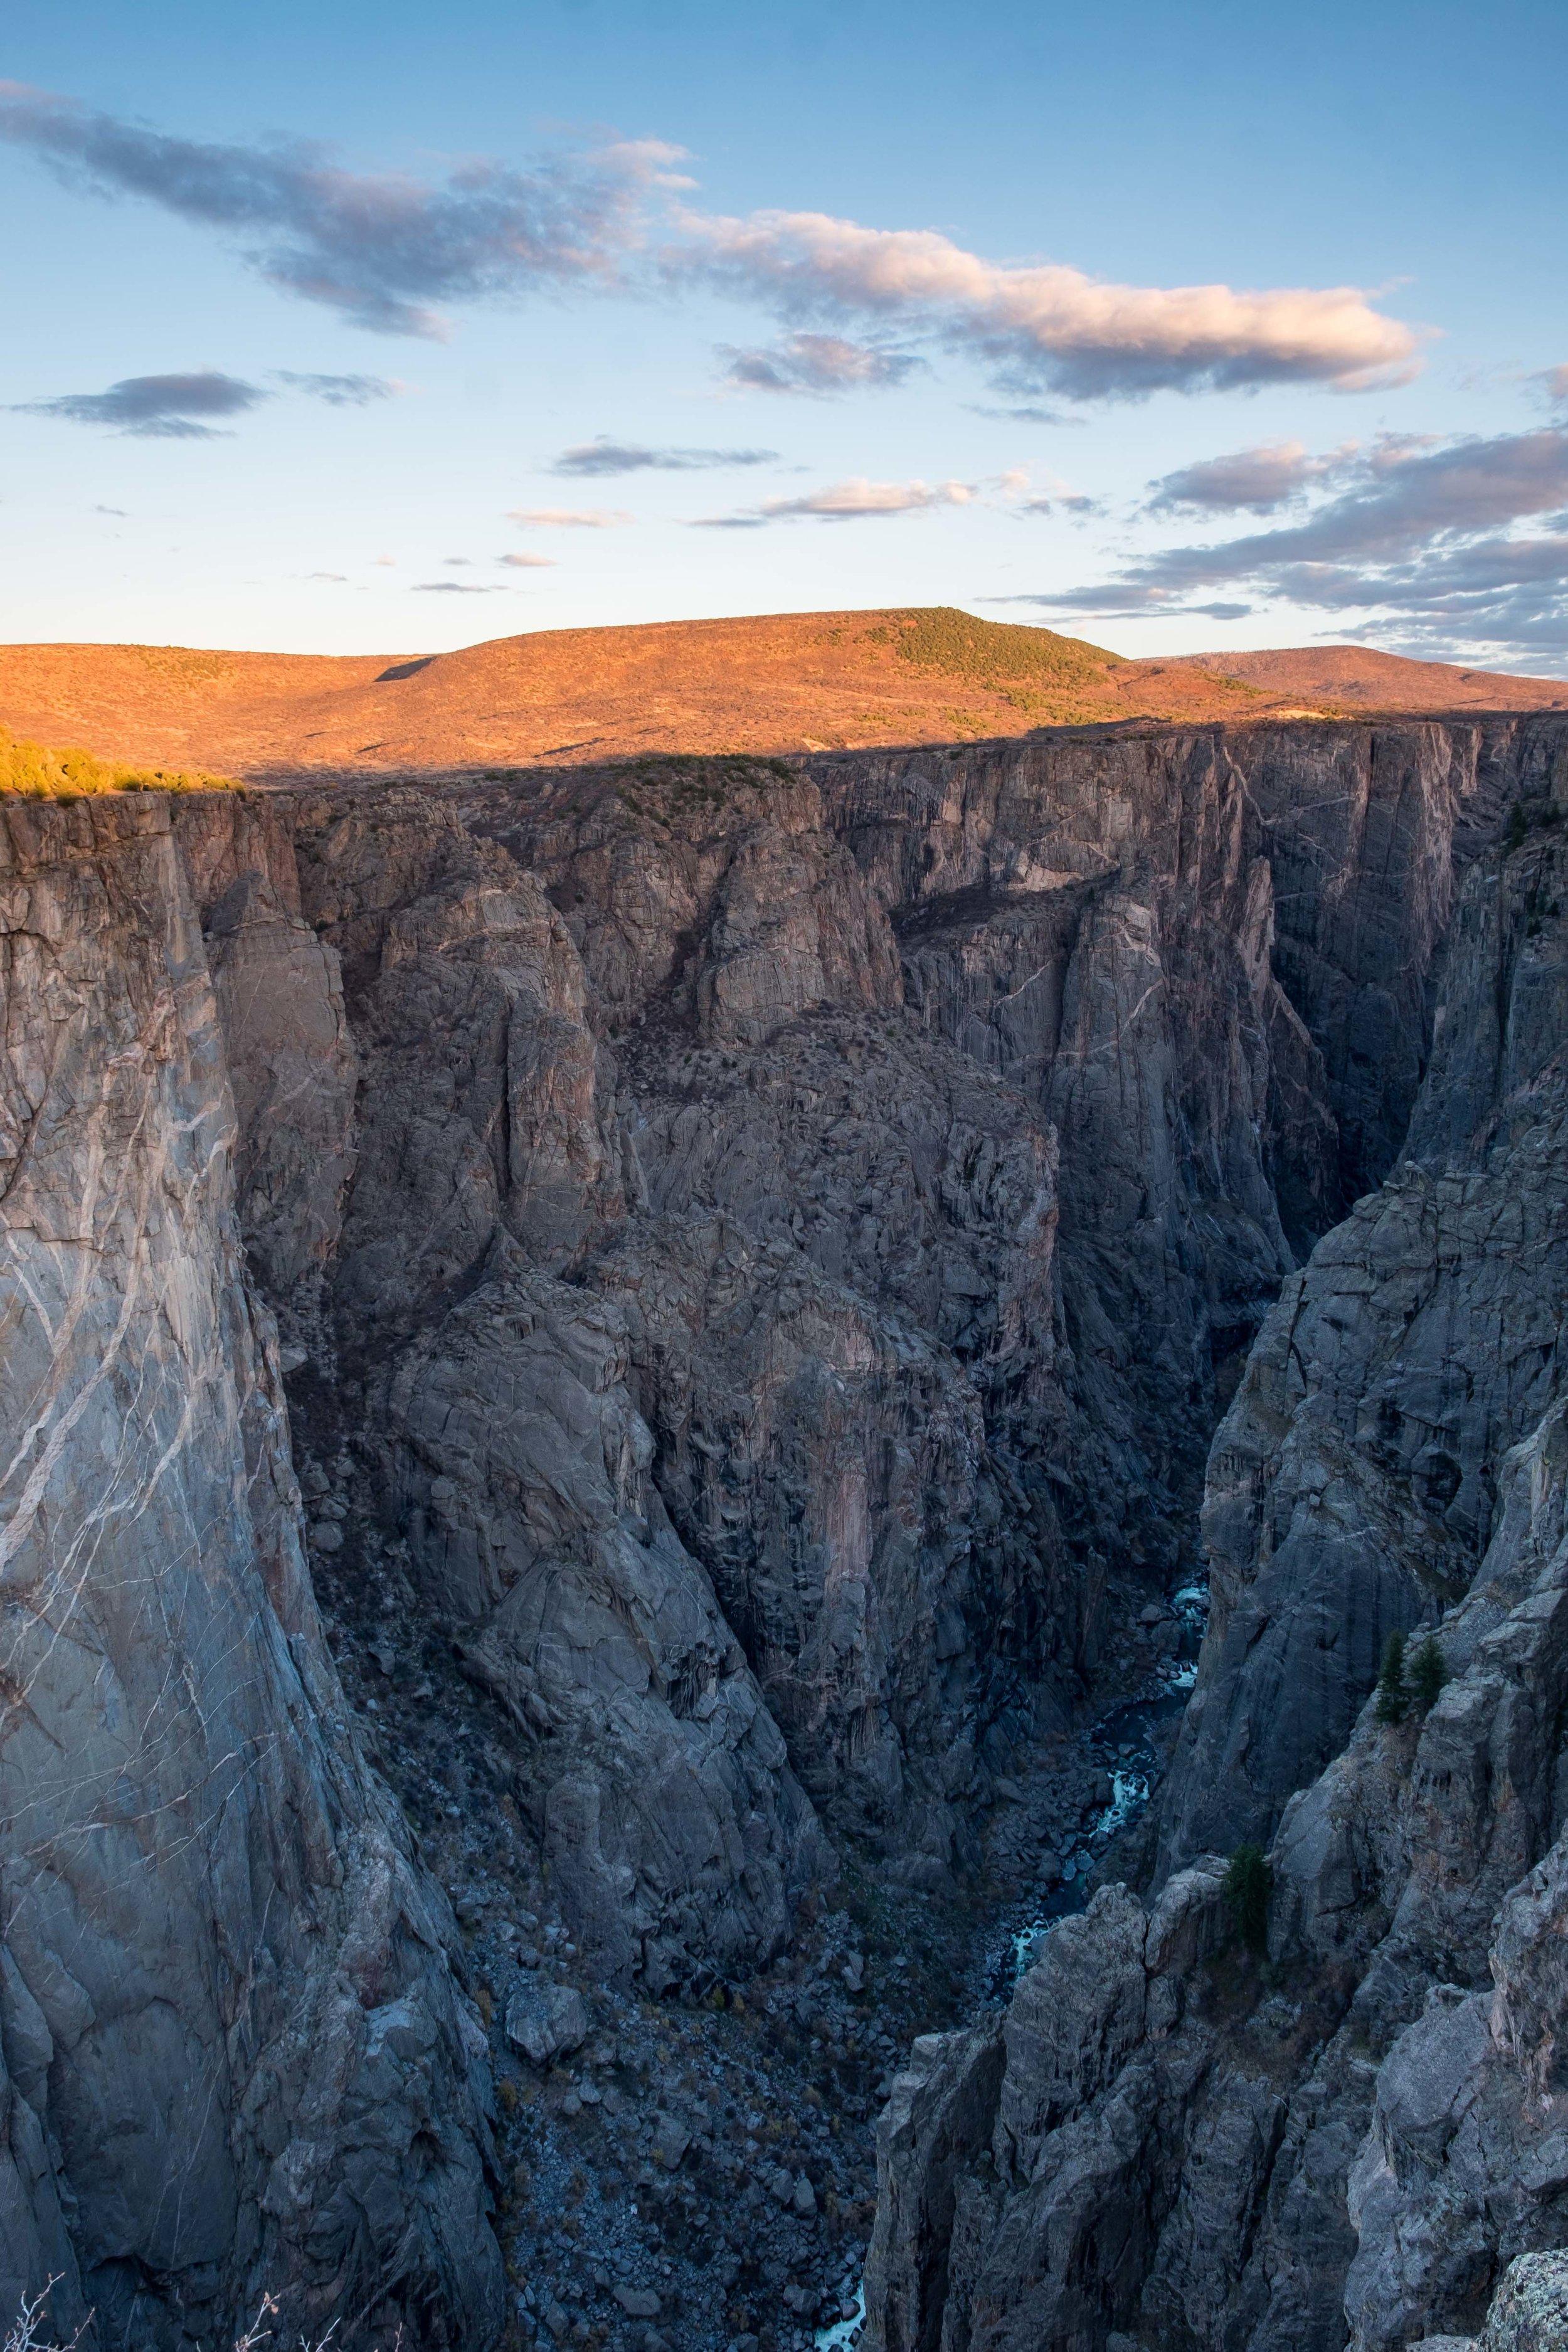 Black Canyon of the Gunnison National Park - 007.jpg